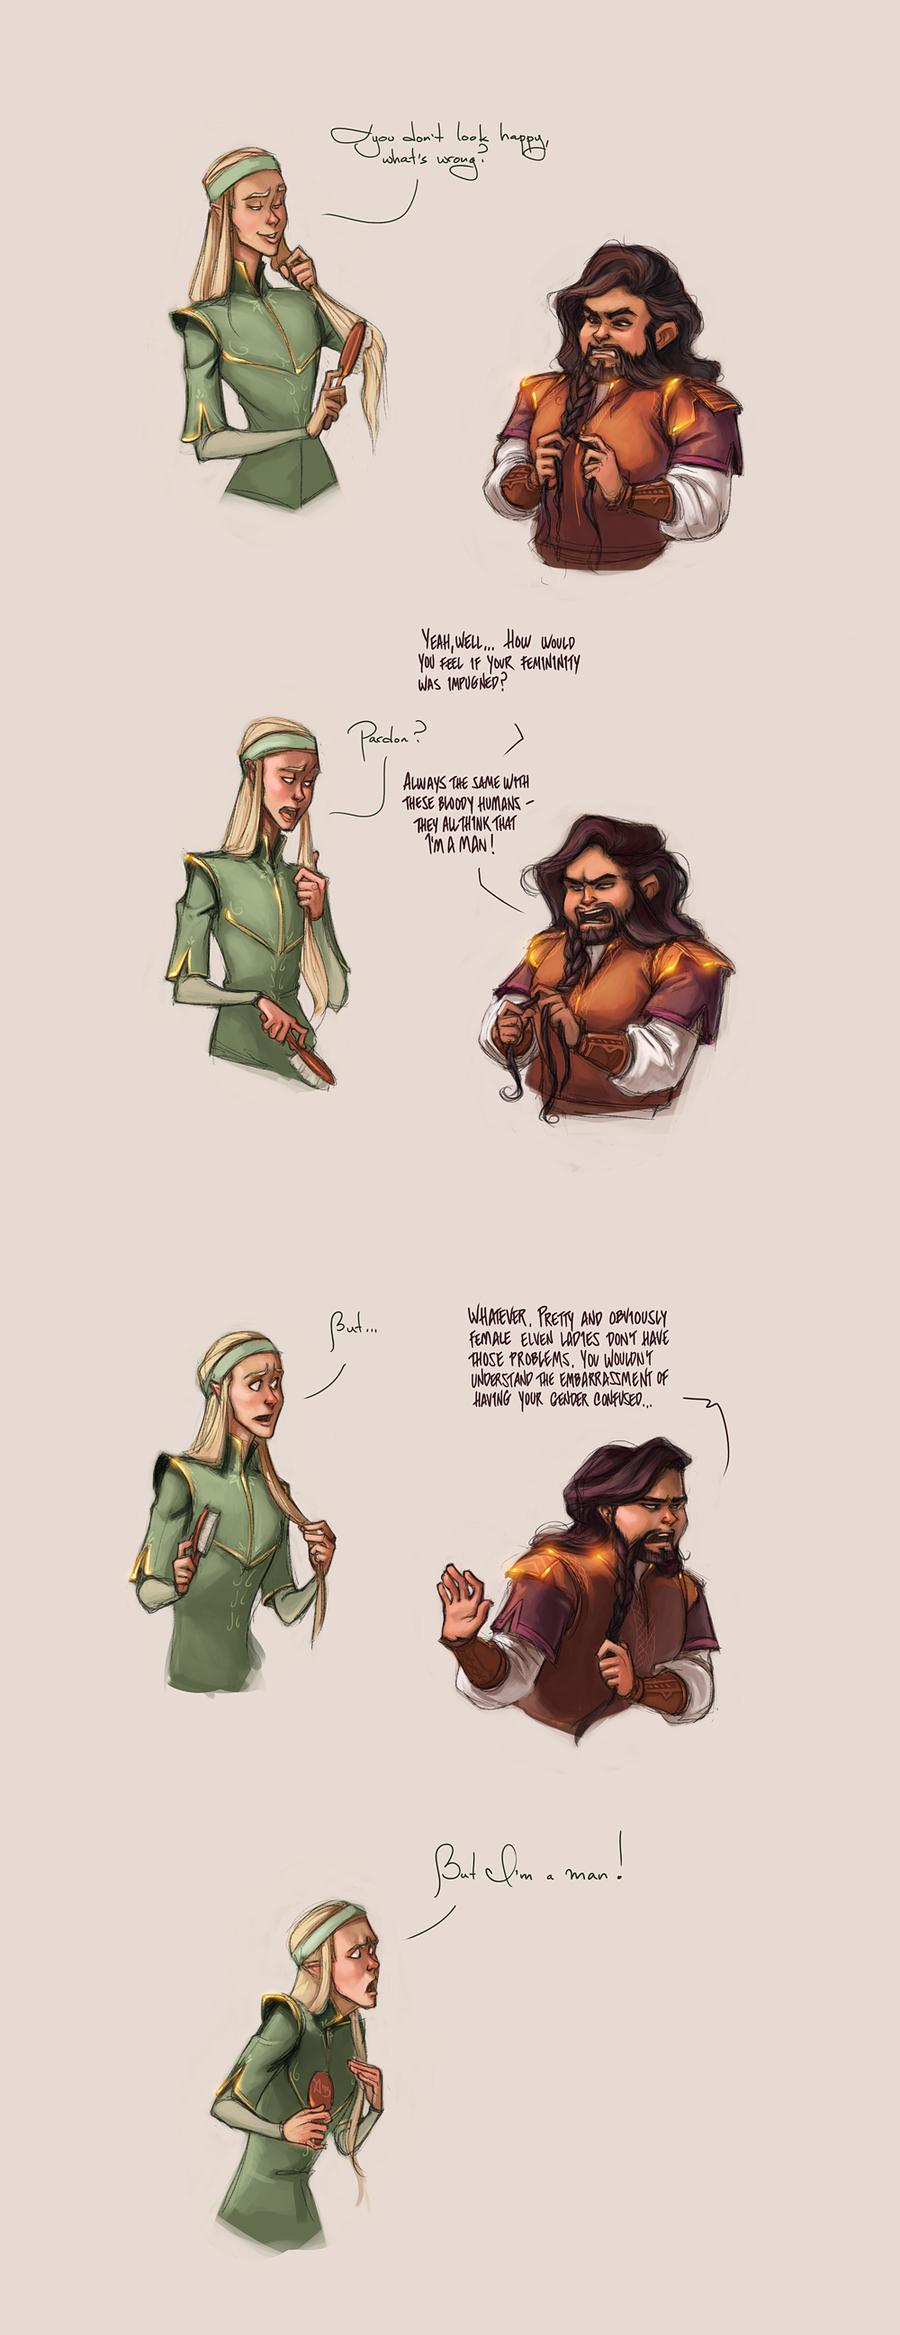 3d elfin dwarf pics xxx gallery